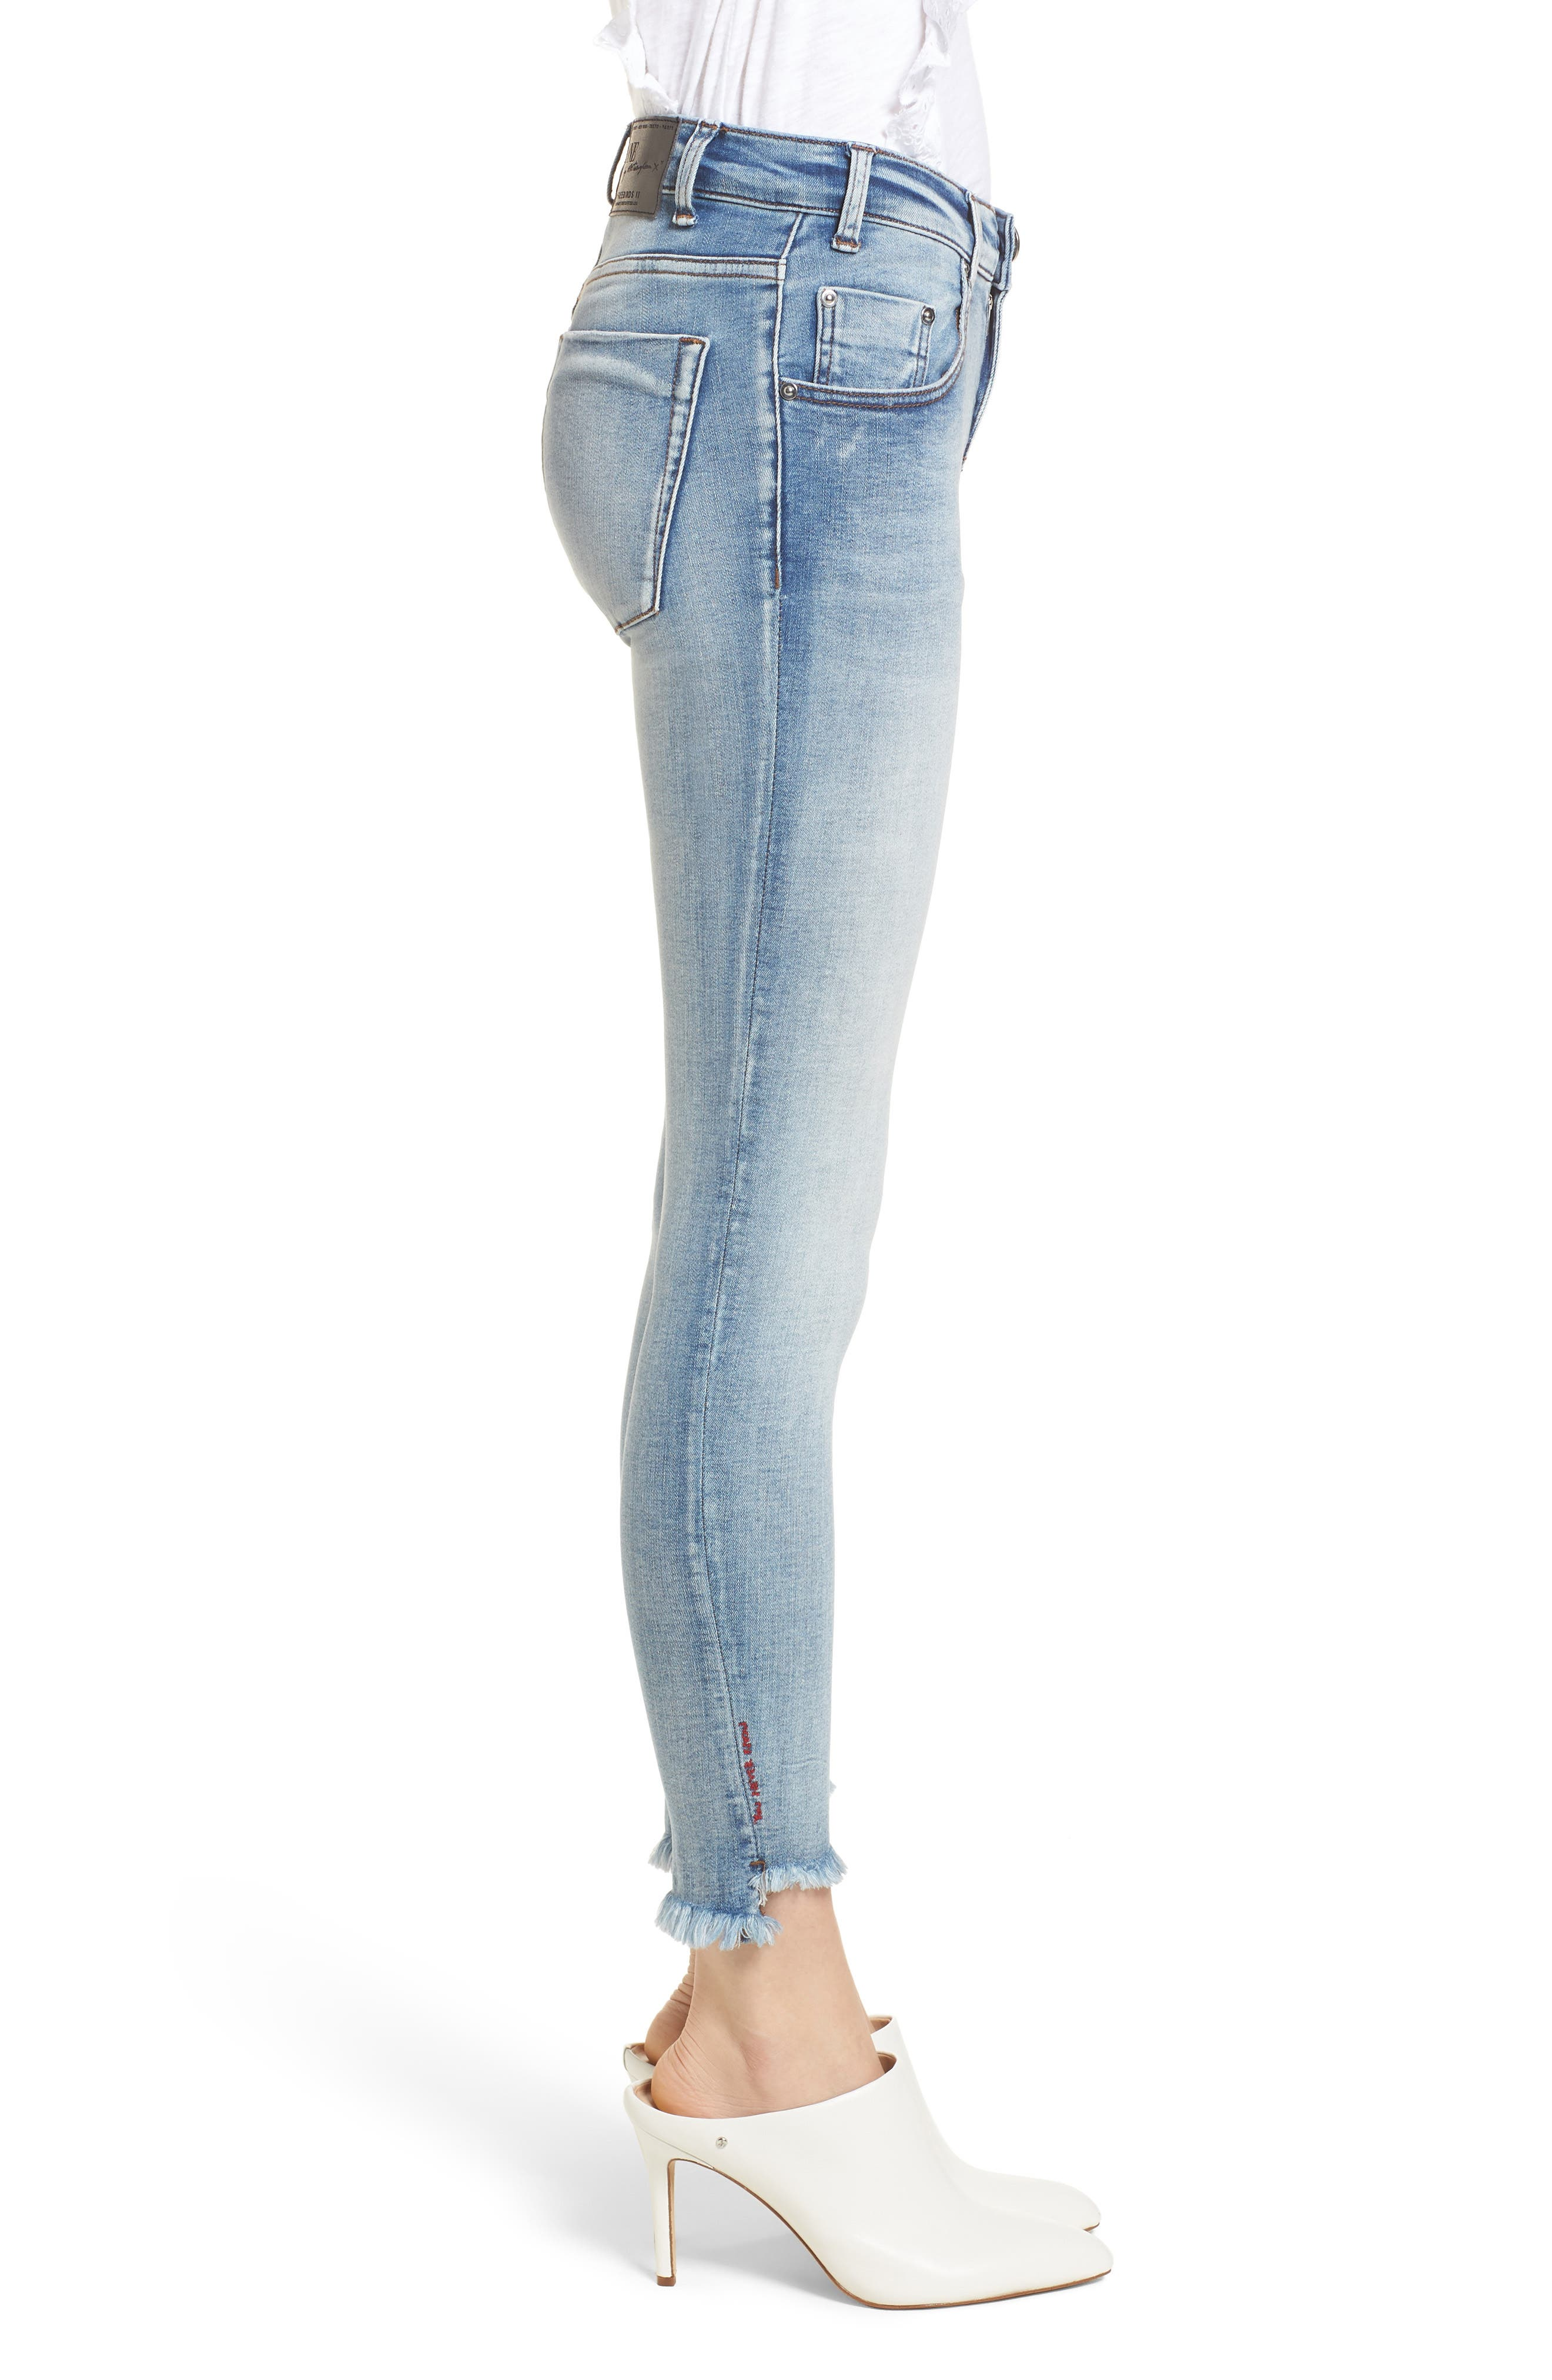 Freebirds Skinny Jeans,                             Alternate thumbnail 3, color,